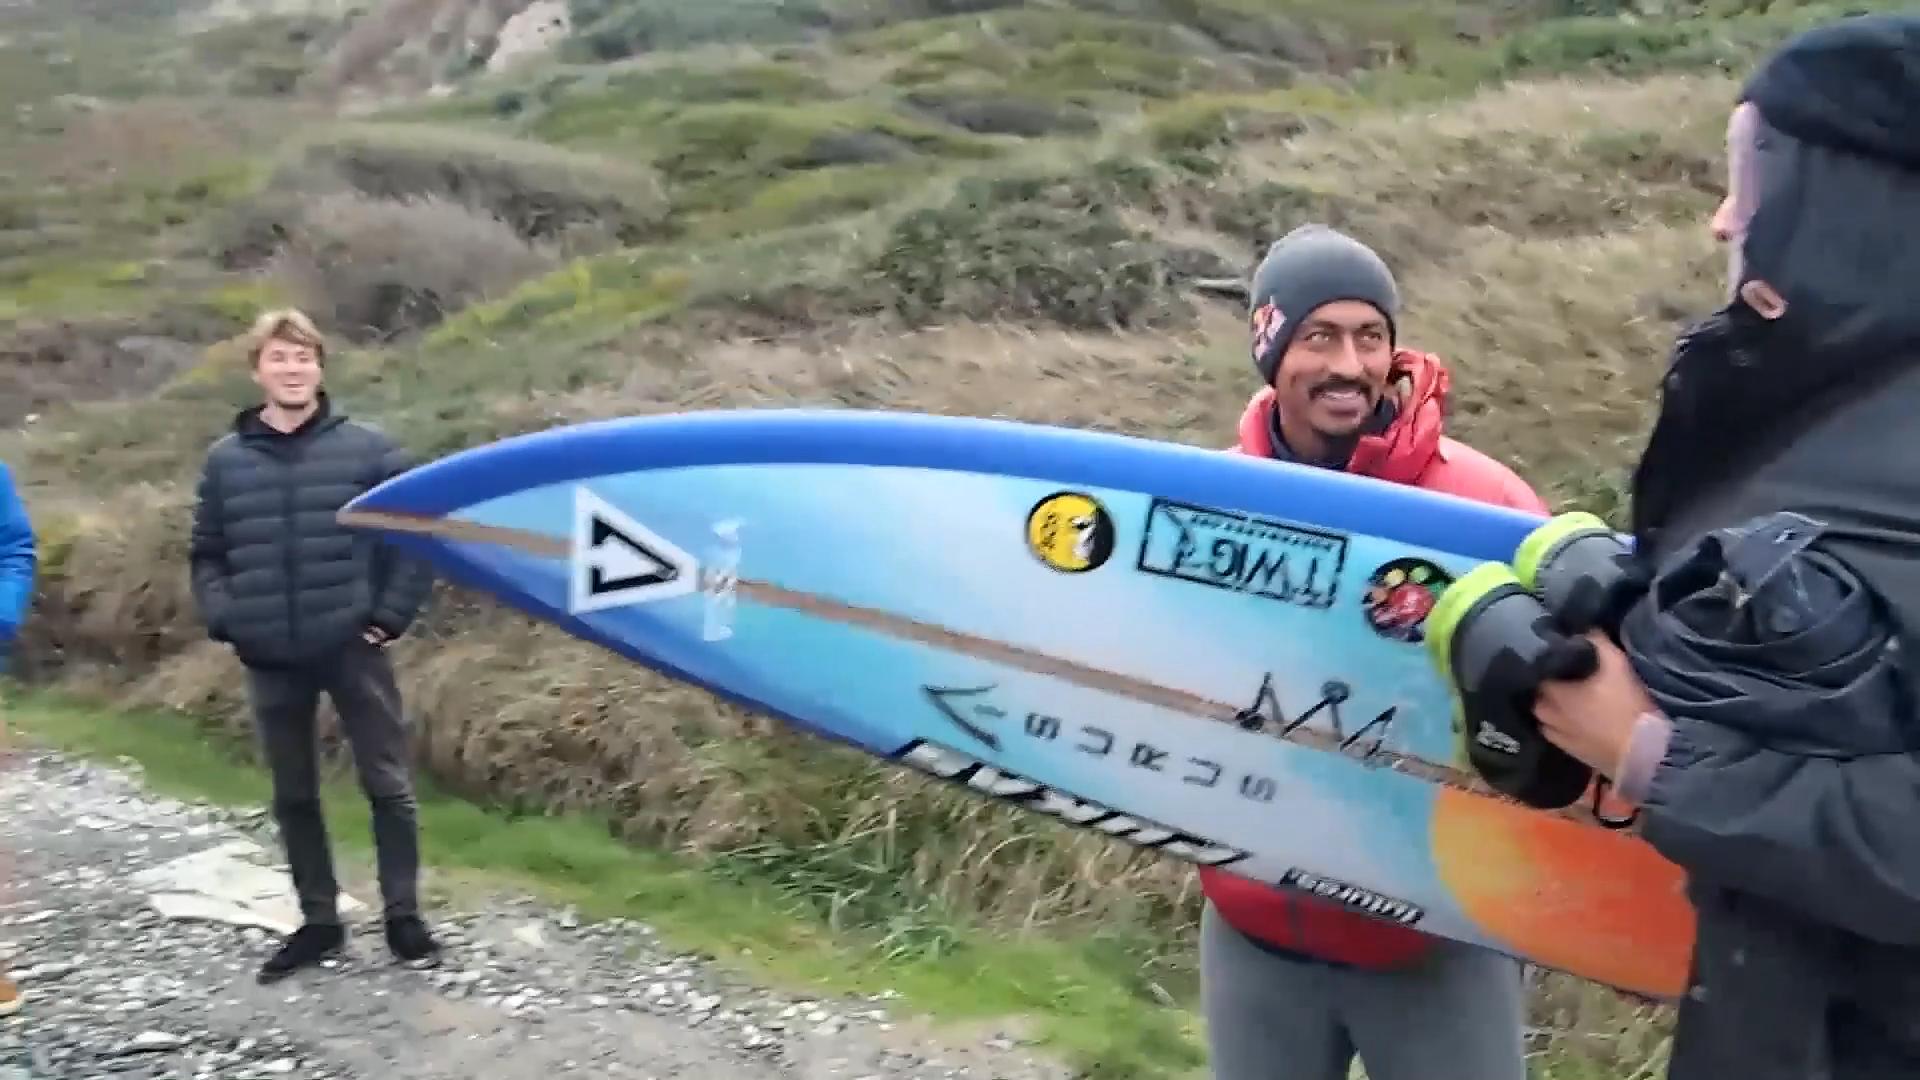 Big Wave in the Basque Country Ingles, with Laurels. Azkena Carrascon.MP4.Imagen fija036.jpg